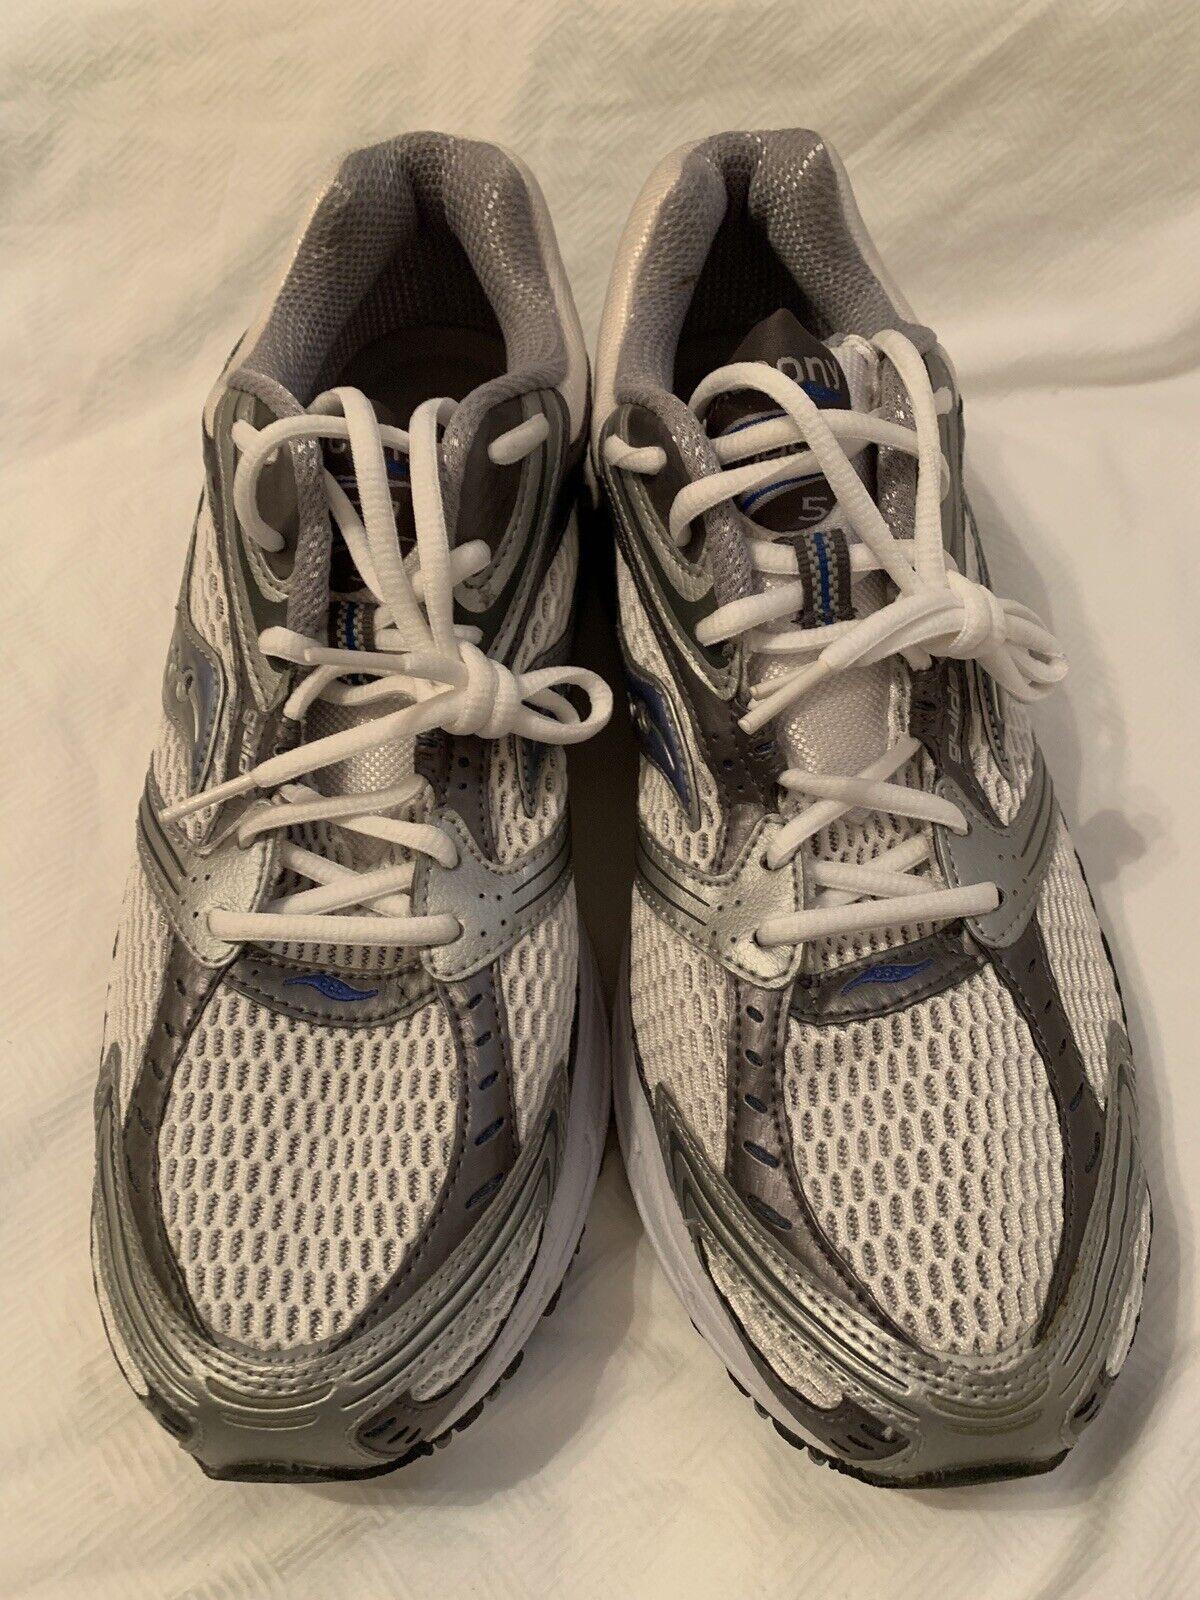 Saucony 2950-2 W Trigon5 Running shoes White Silver bluee Men's 12 UK 11 EUR 46.5